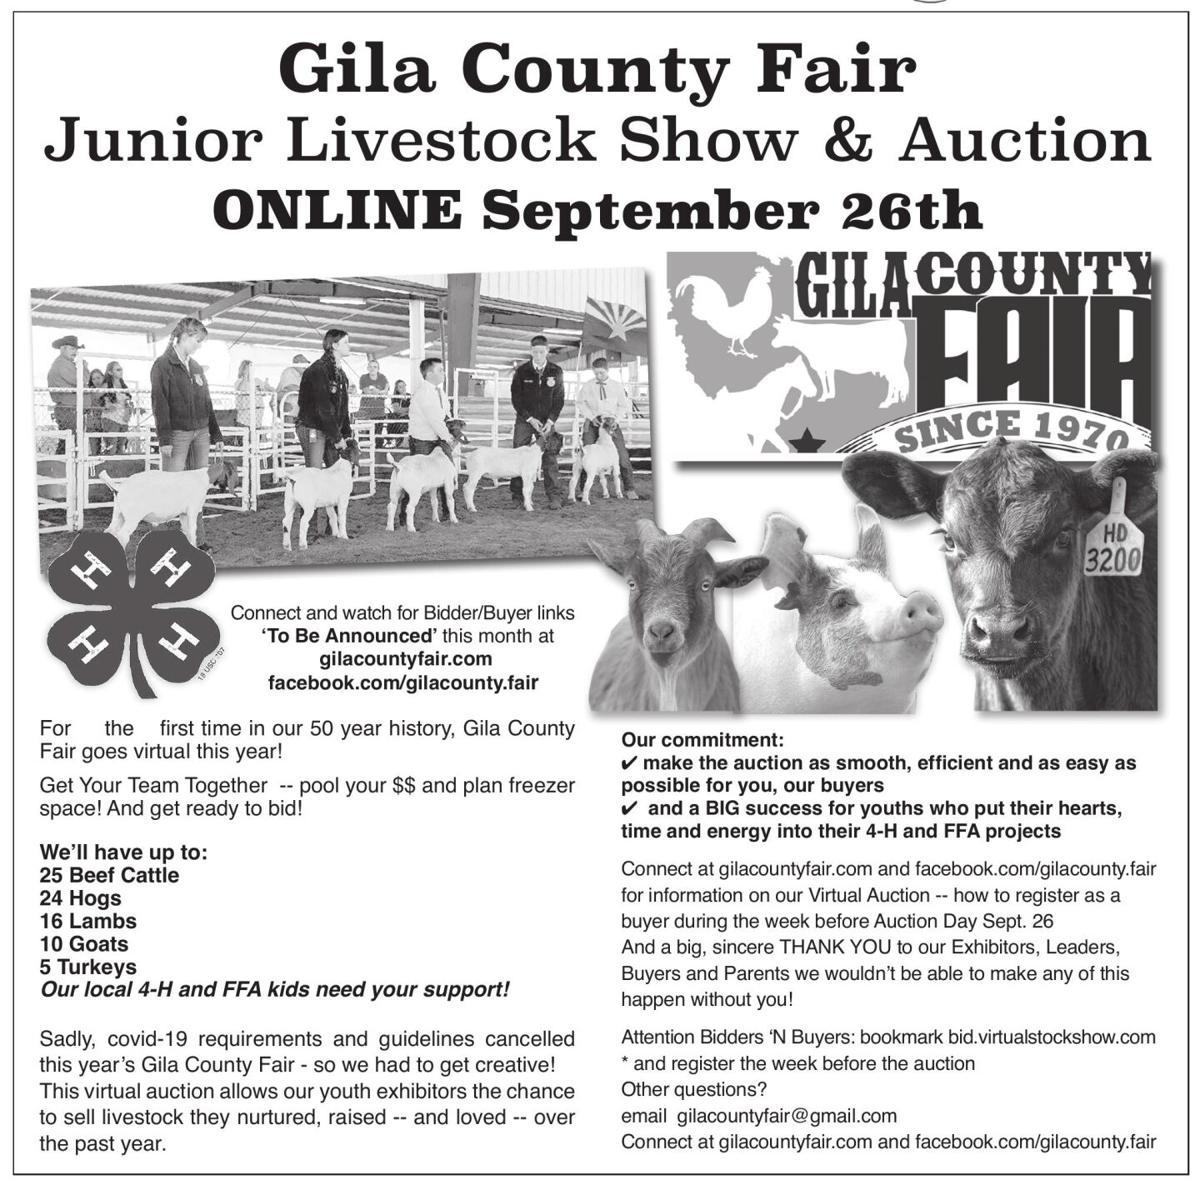 Junior Livestock Show & Auction